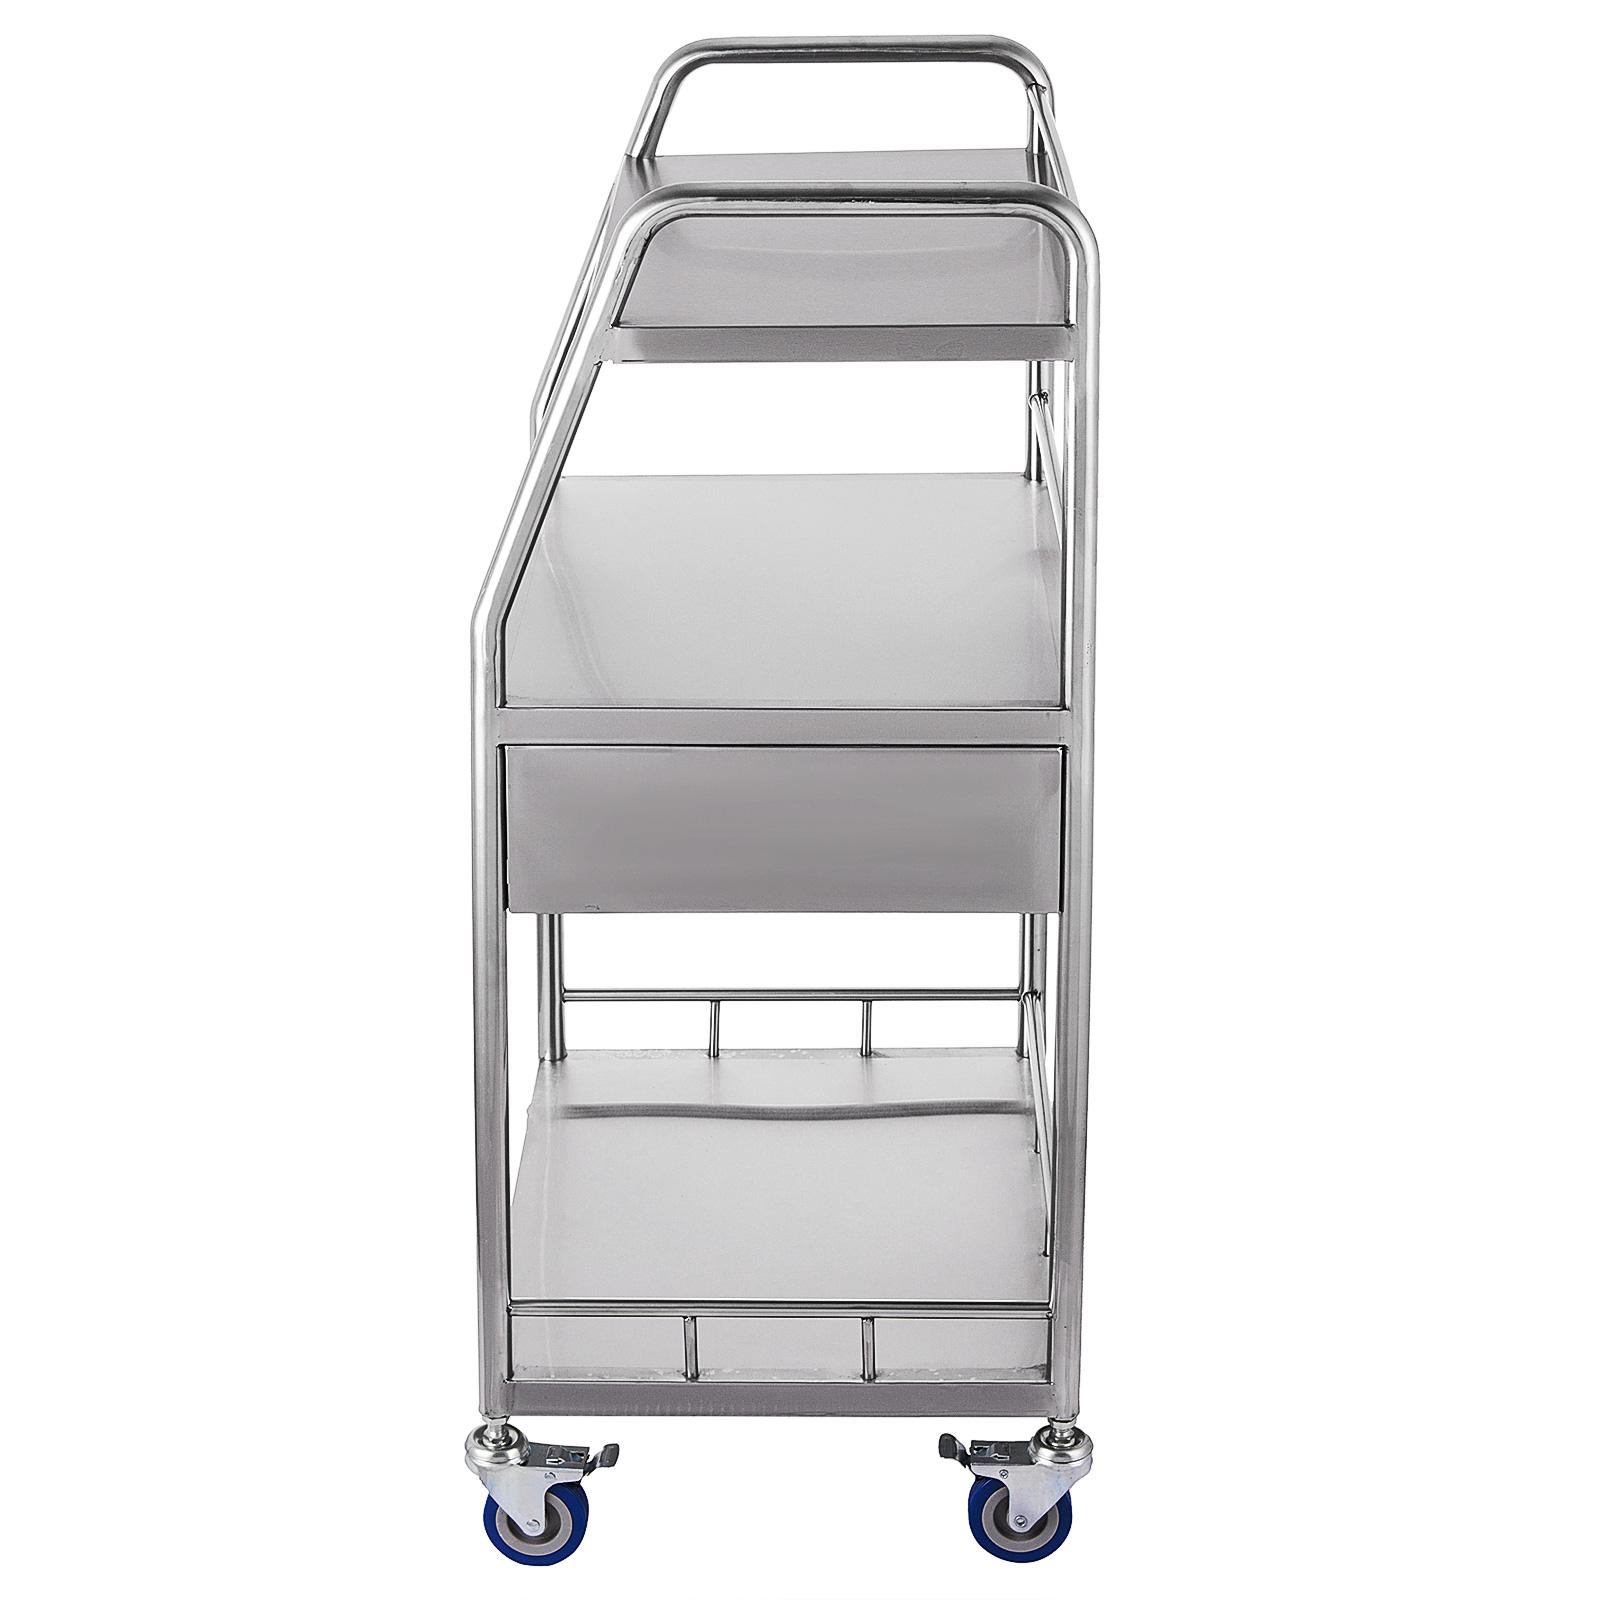 thumbnail 71 - Rolling Storage Cart Medical Salon Trolley Pedestal Rolling Cart Stainless Steel